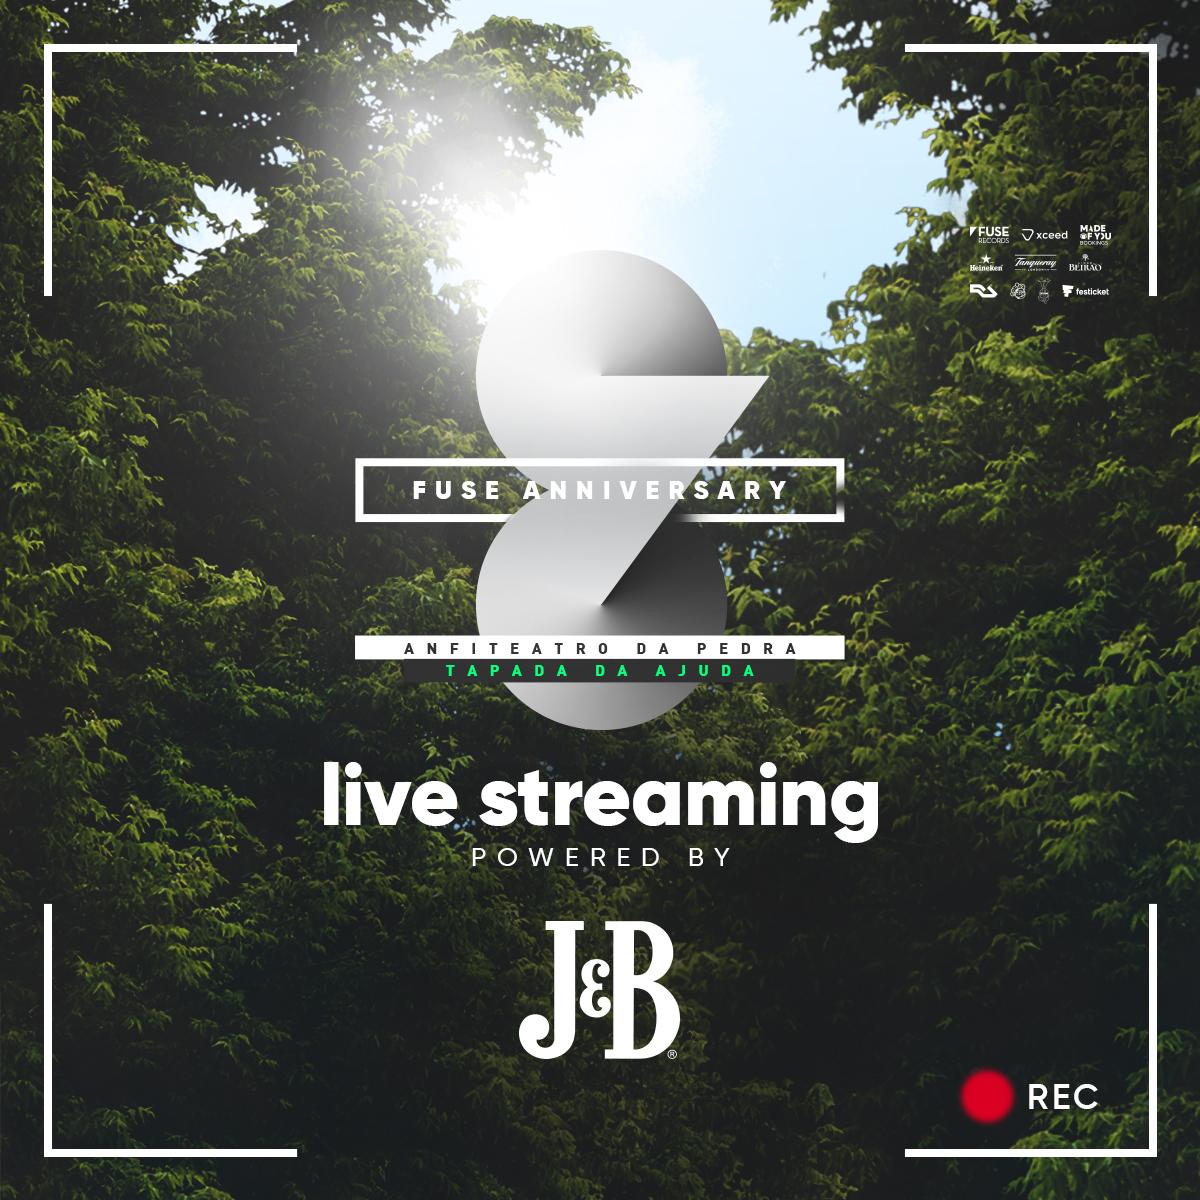 FuseMatine_aniversario_Profile_Livestream.jpg